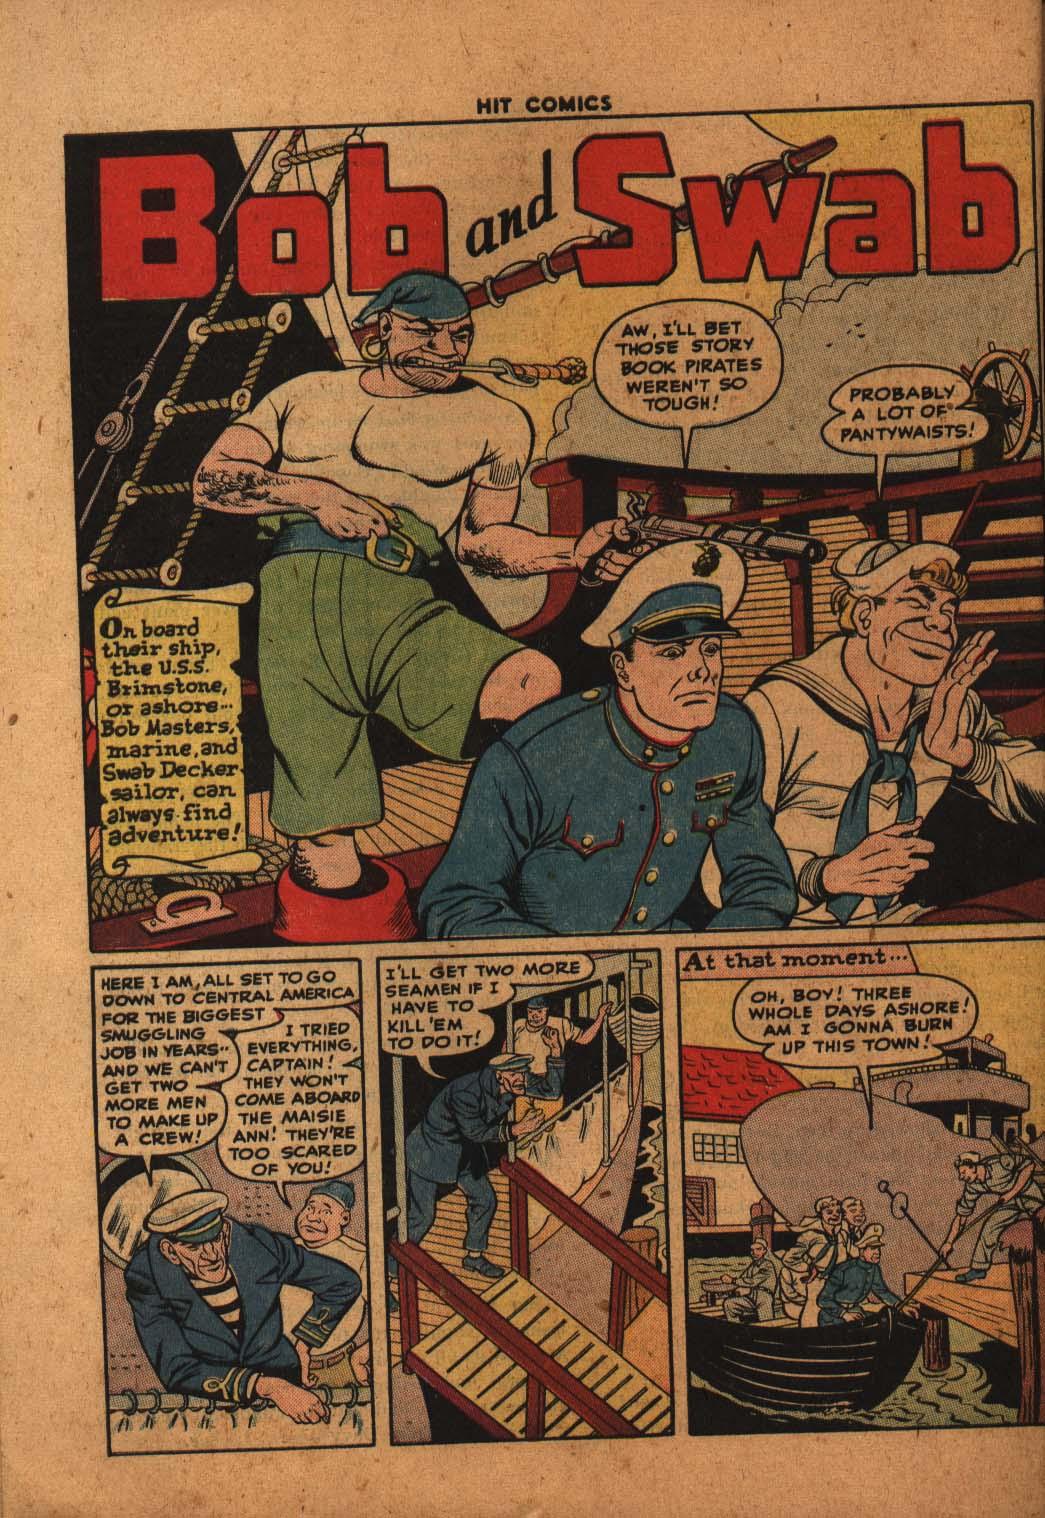 Read online Hit Comics comic -  Issue #47 - 39